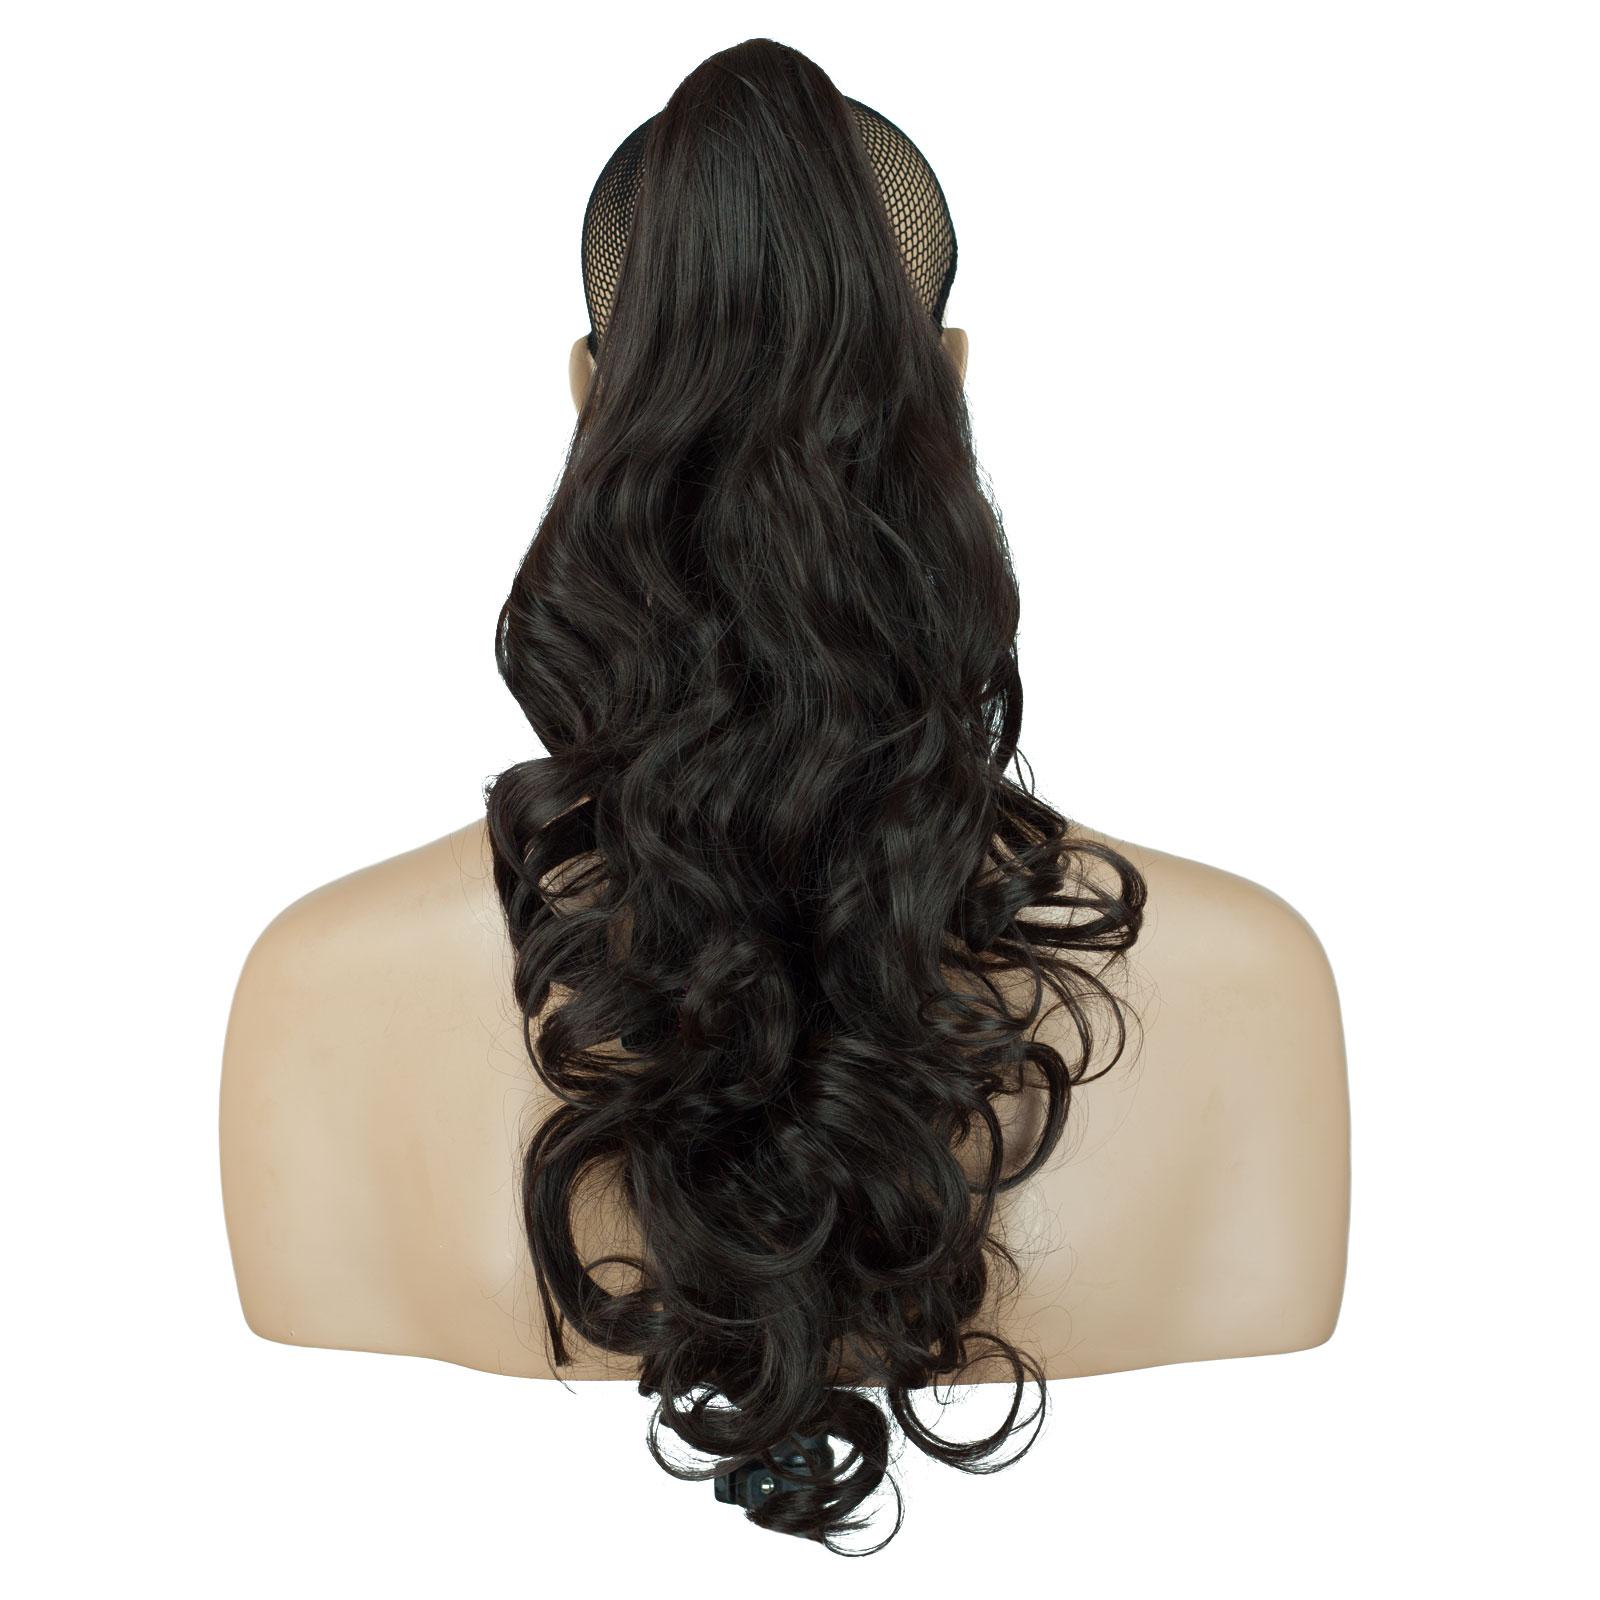 Ponytail Clip In On Hair Extensions Dark Brown 4 Reversible 4